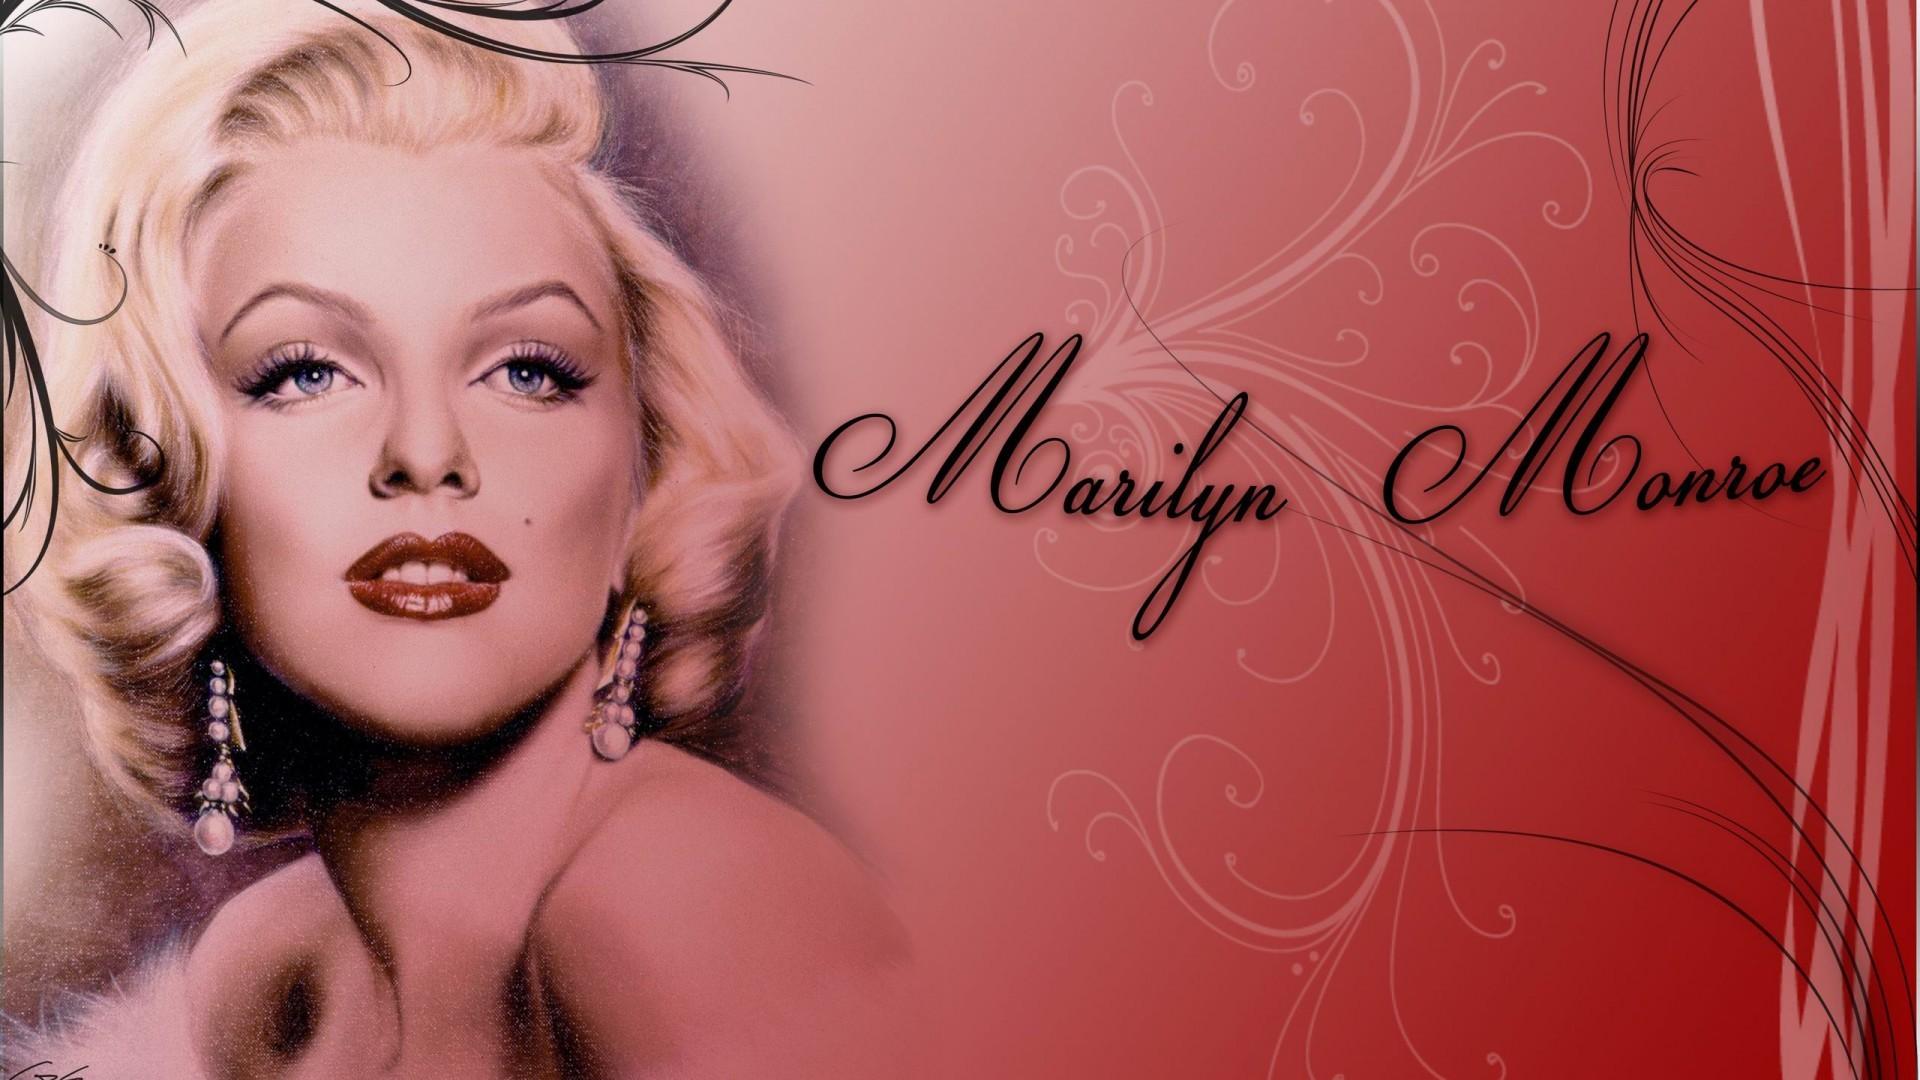 Marilyn-monroe-wallpaper-15-cute-Collection-marilyn-monroe-